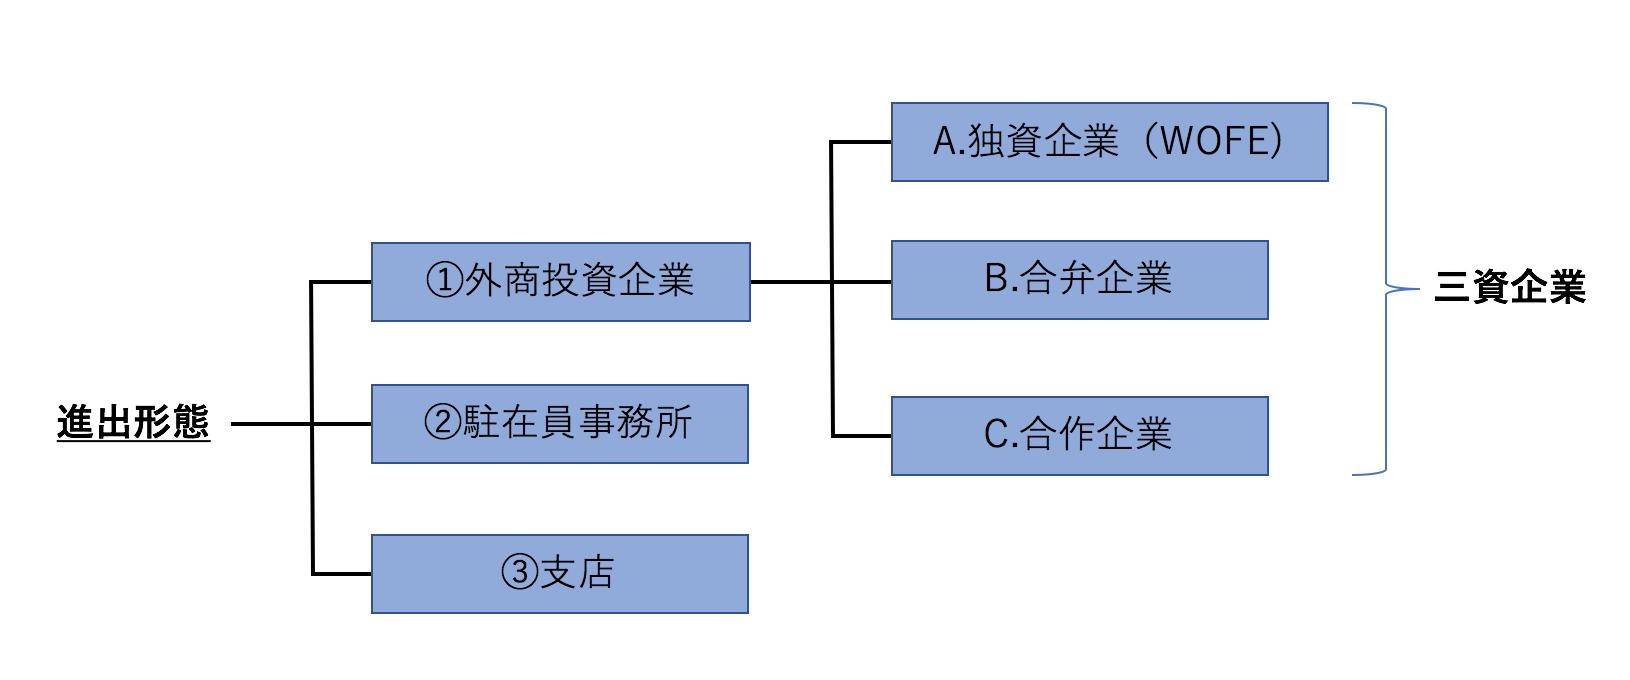 中国進出時の3形態